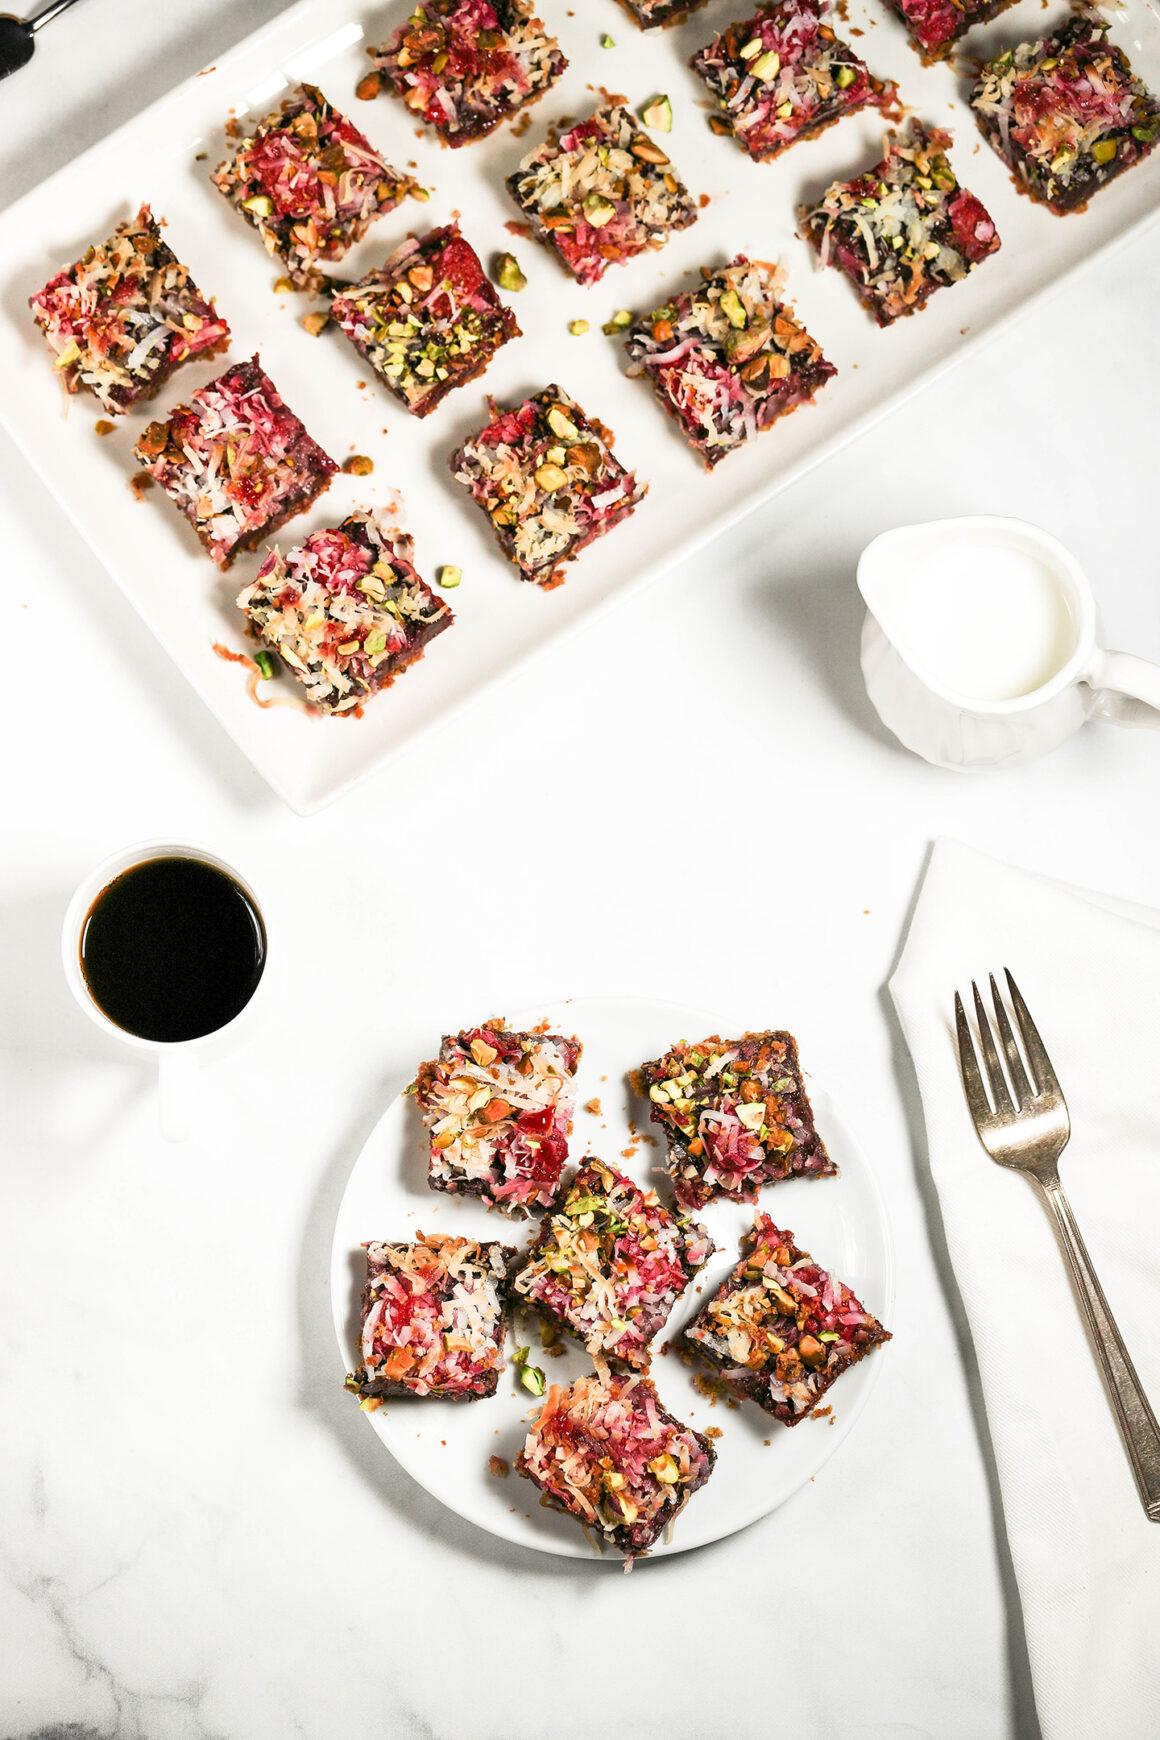 raspberry dessert bars with pistachio crust